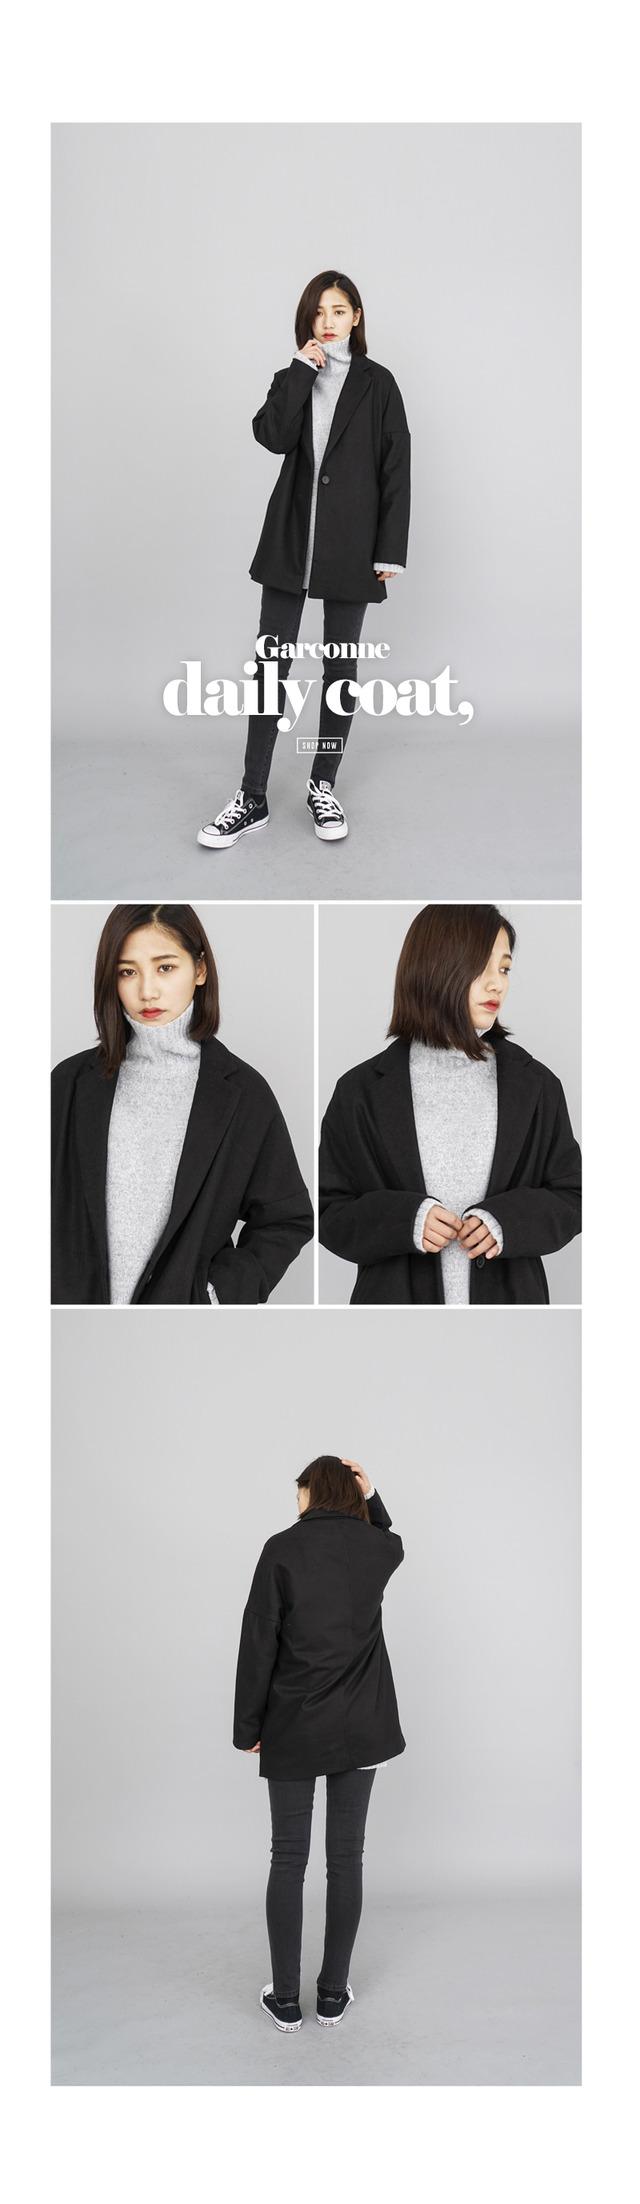 Course coat